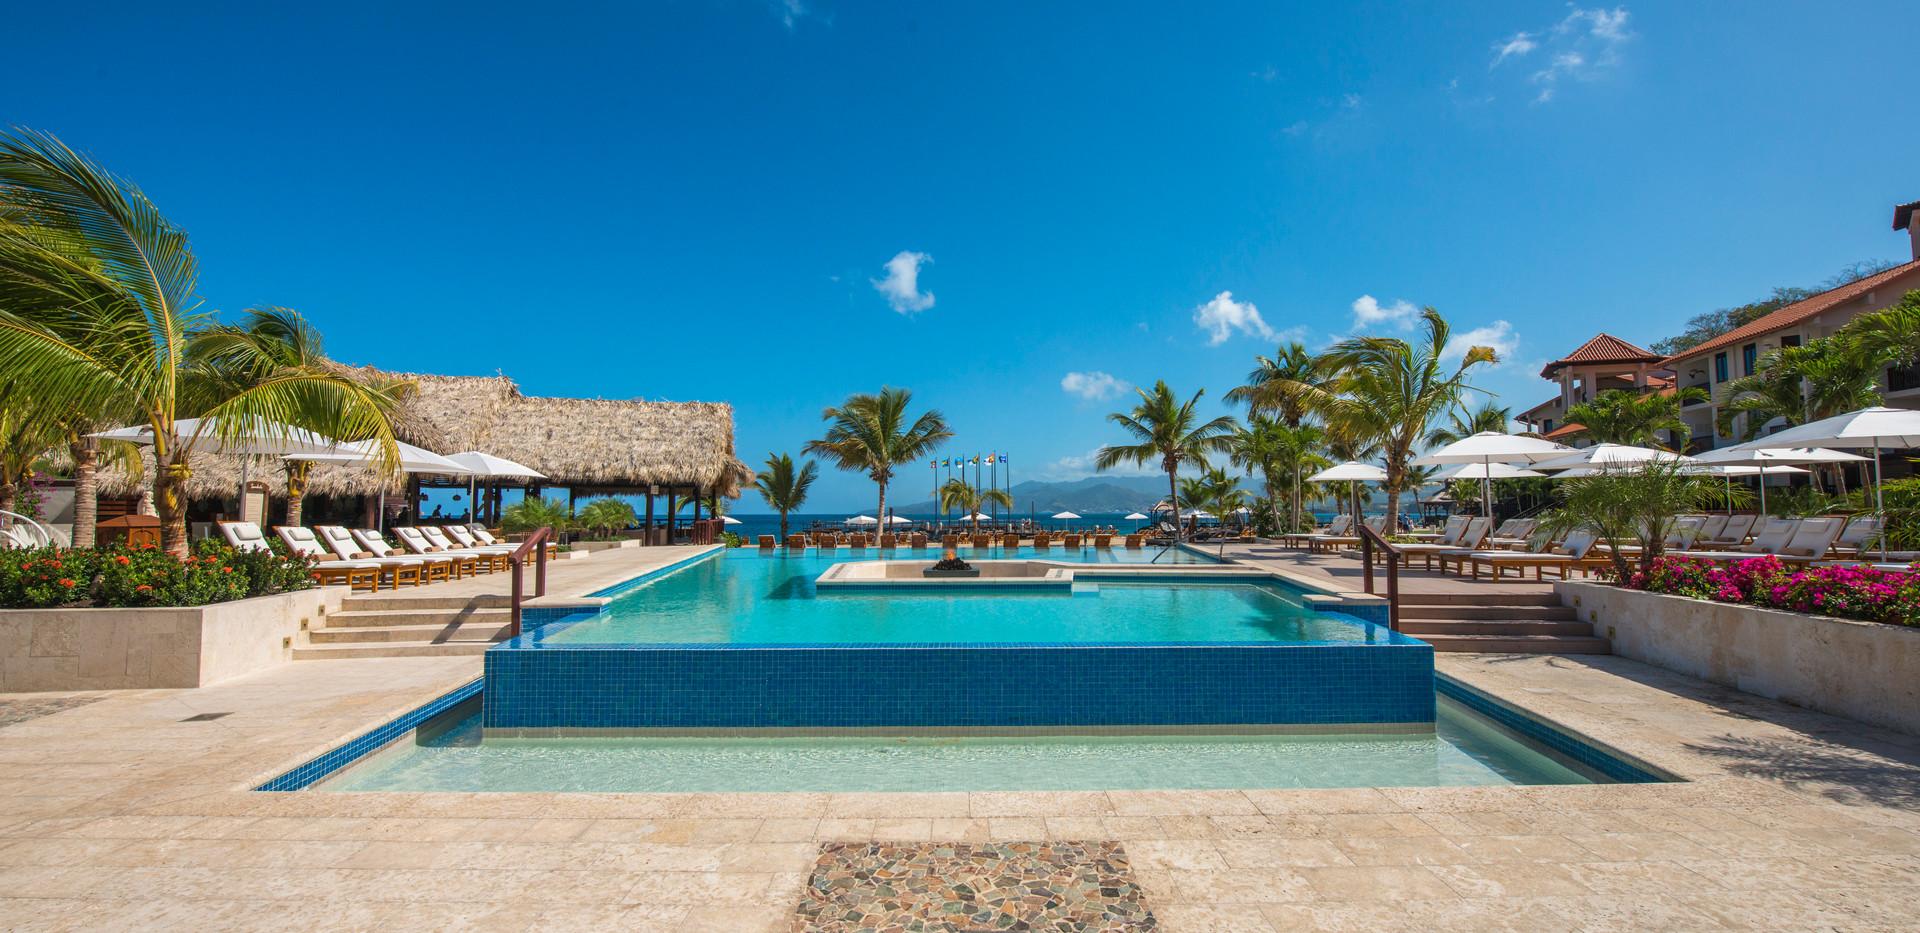 Grenada Pool 4.jpeg